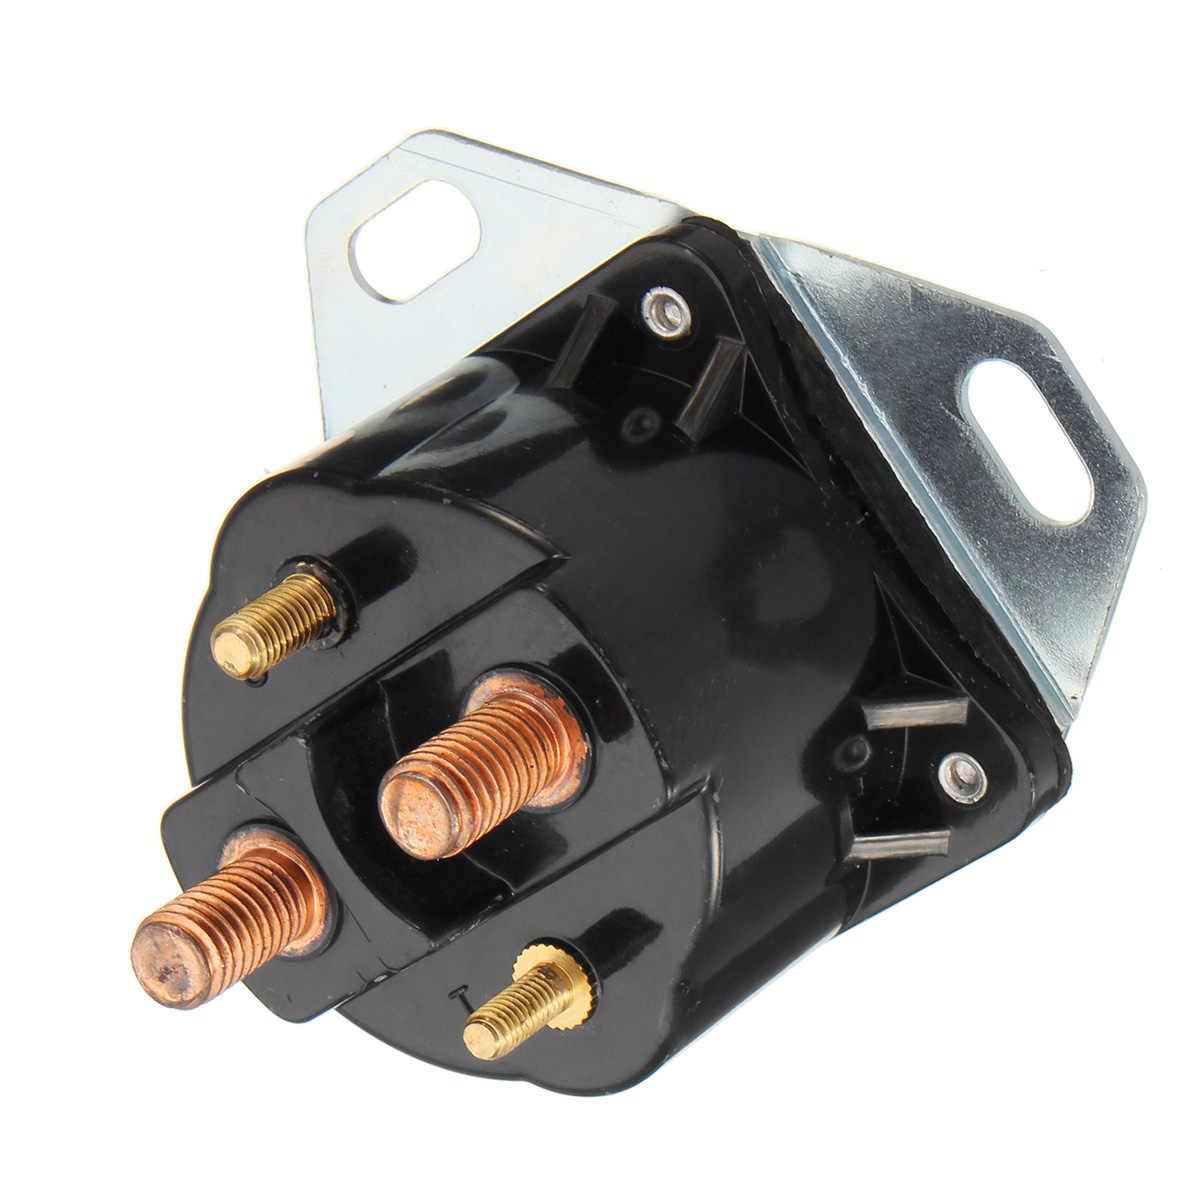 small resolution of  9pcs 7 3l car powerstroke for diesel glow for spark plug glowplug relay solenoid heater plug